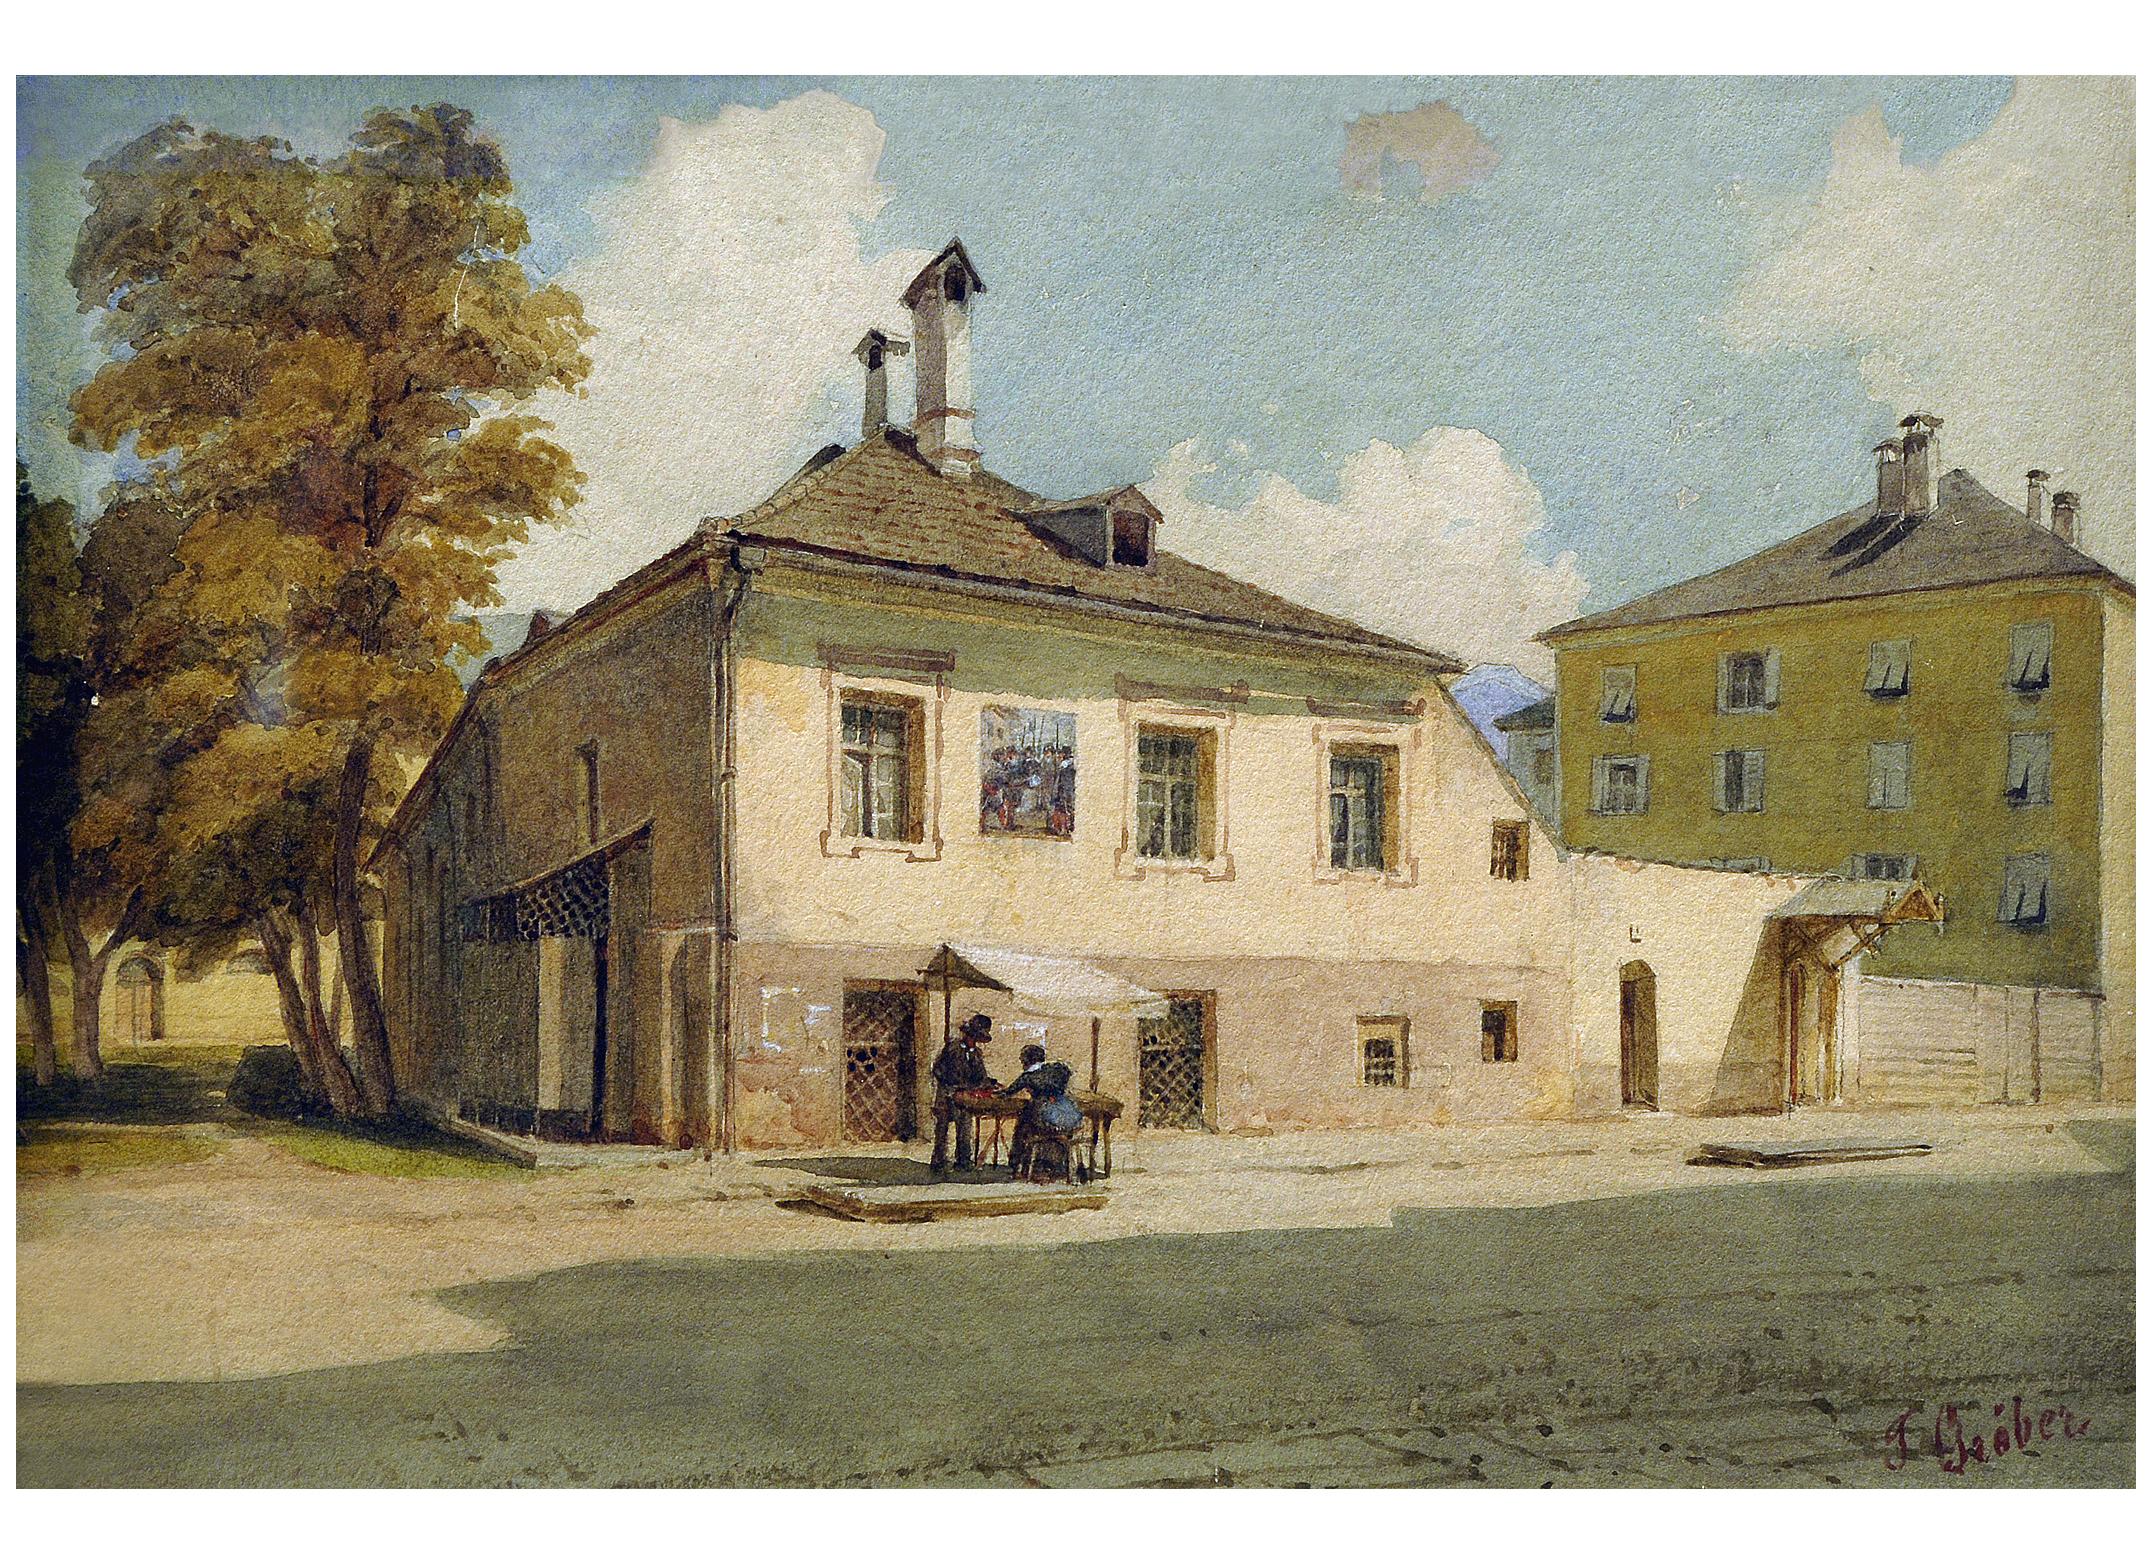 Ein Blick Ins 19. Jahrhundert – I